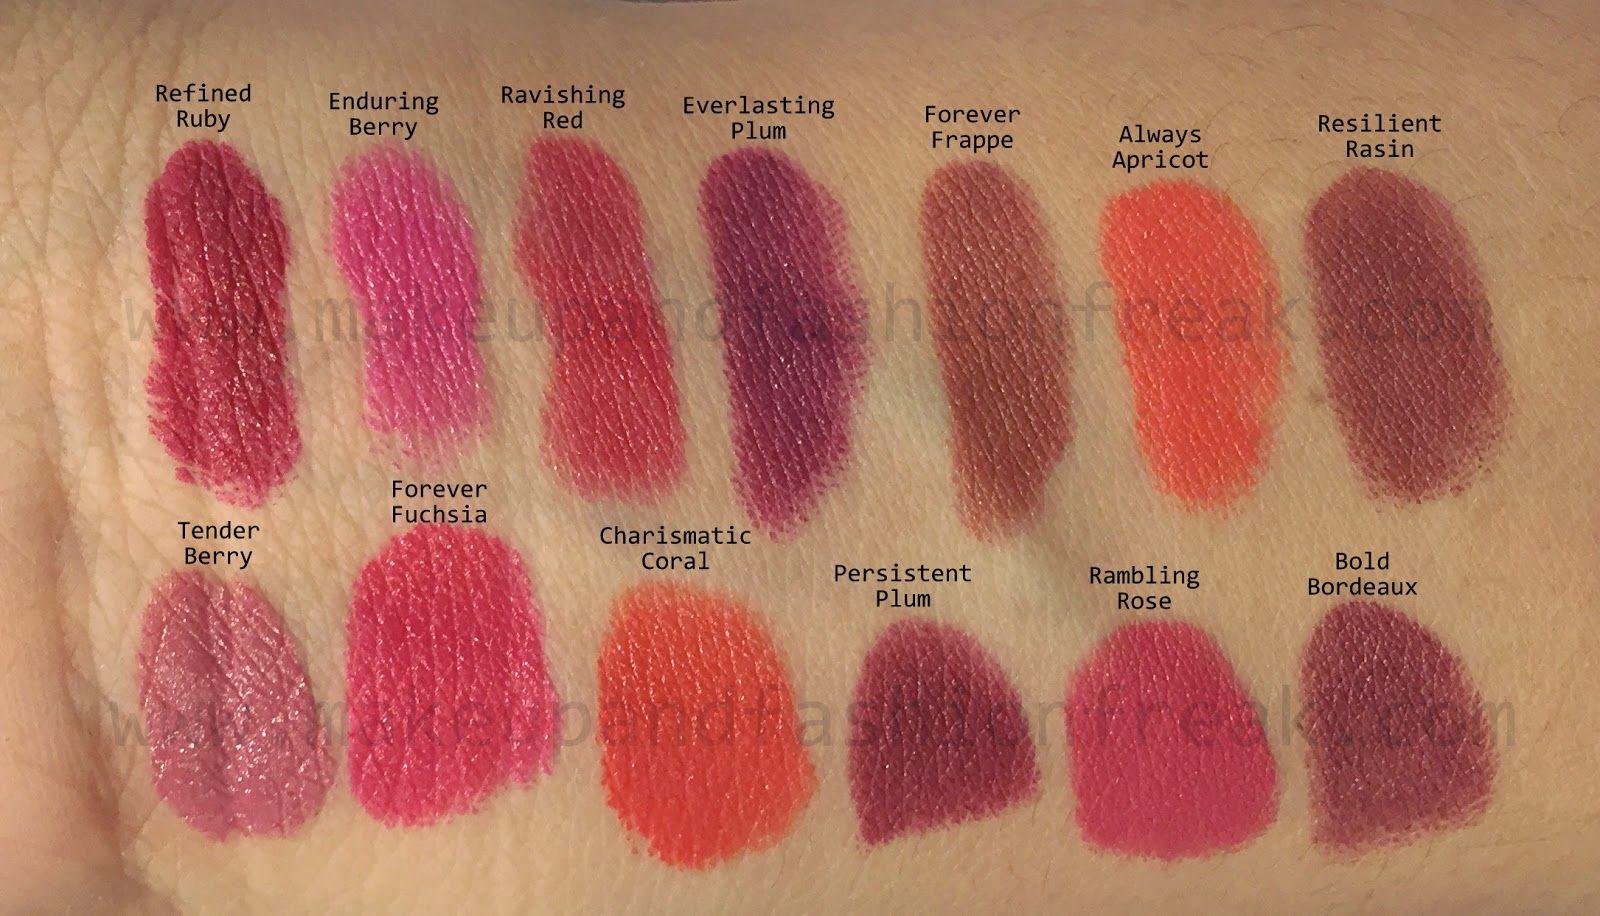 Infallible Pro Matte Liquid Lipstick by L'Oreal #6